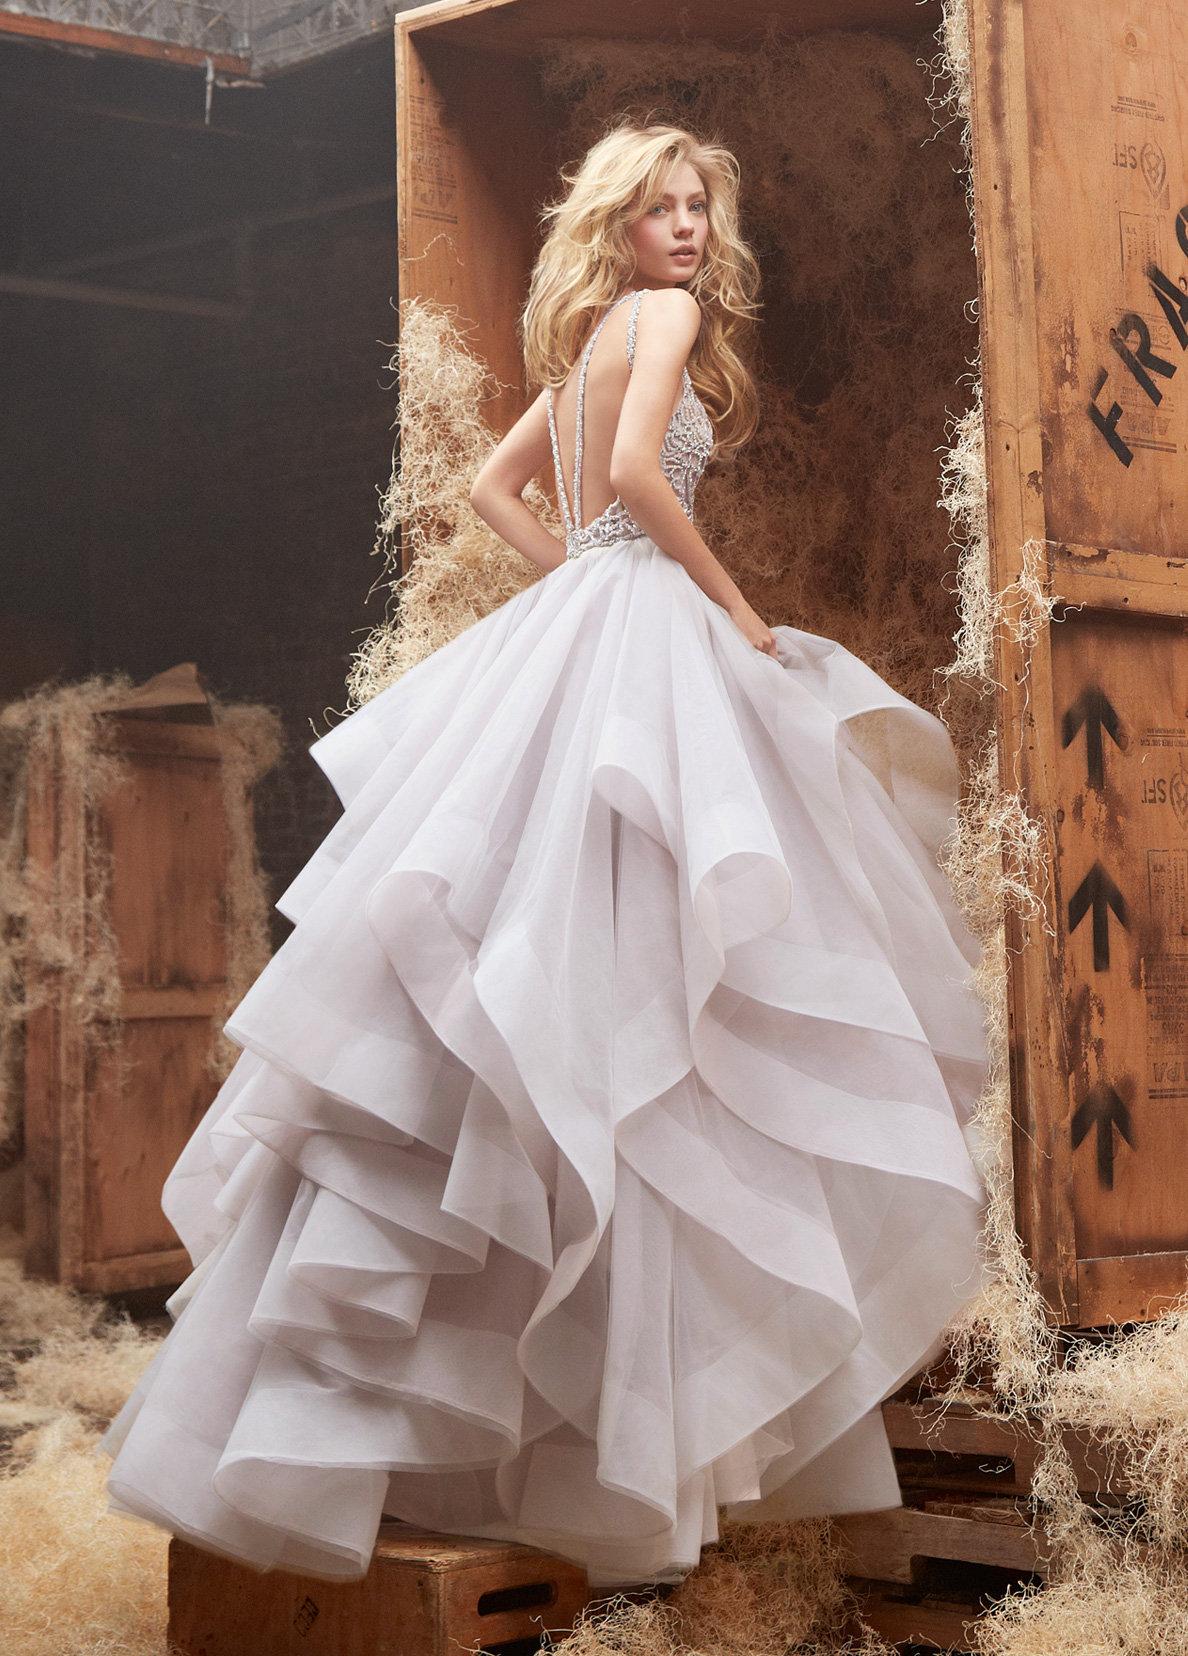 Nastia Liukin Wedding.Nastia Liukin Shines In Dori Gown By Hayley Paige Jlm